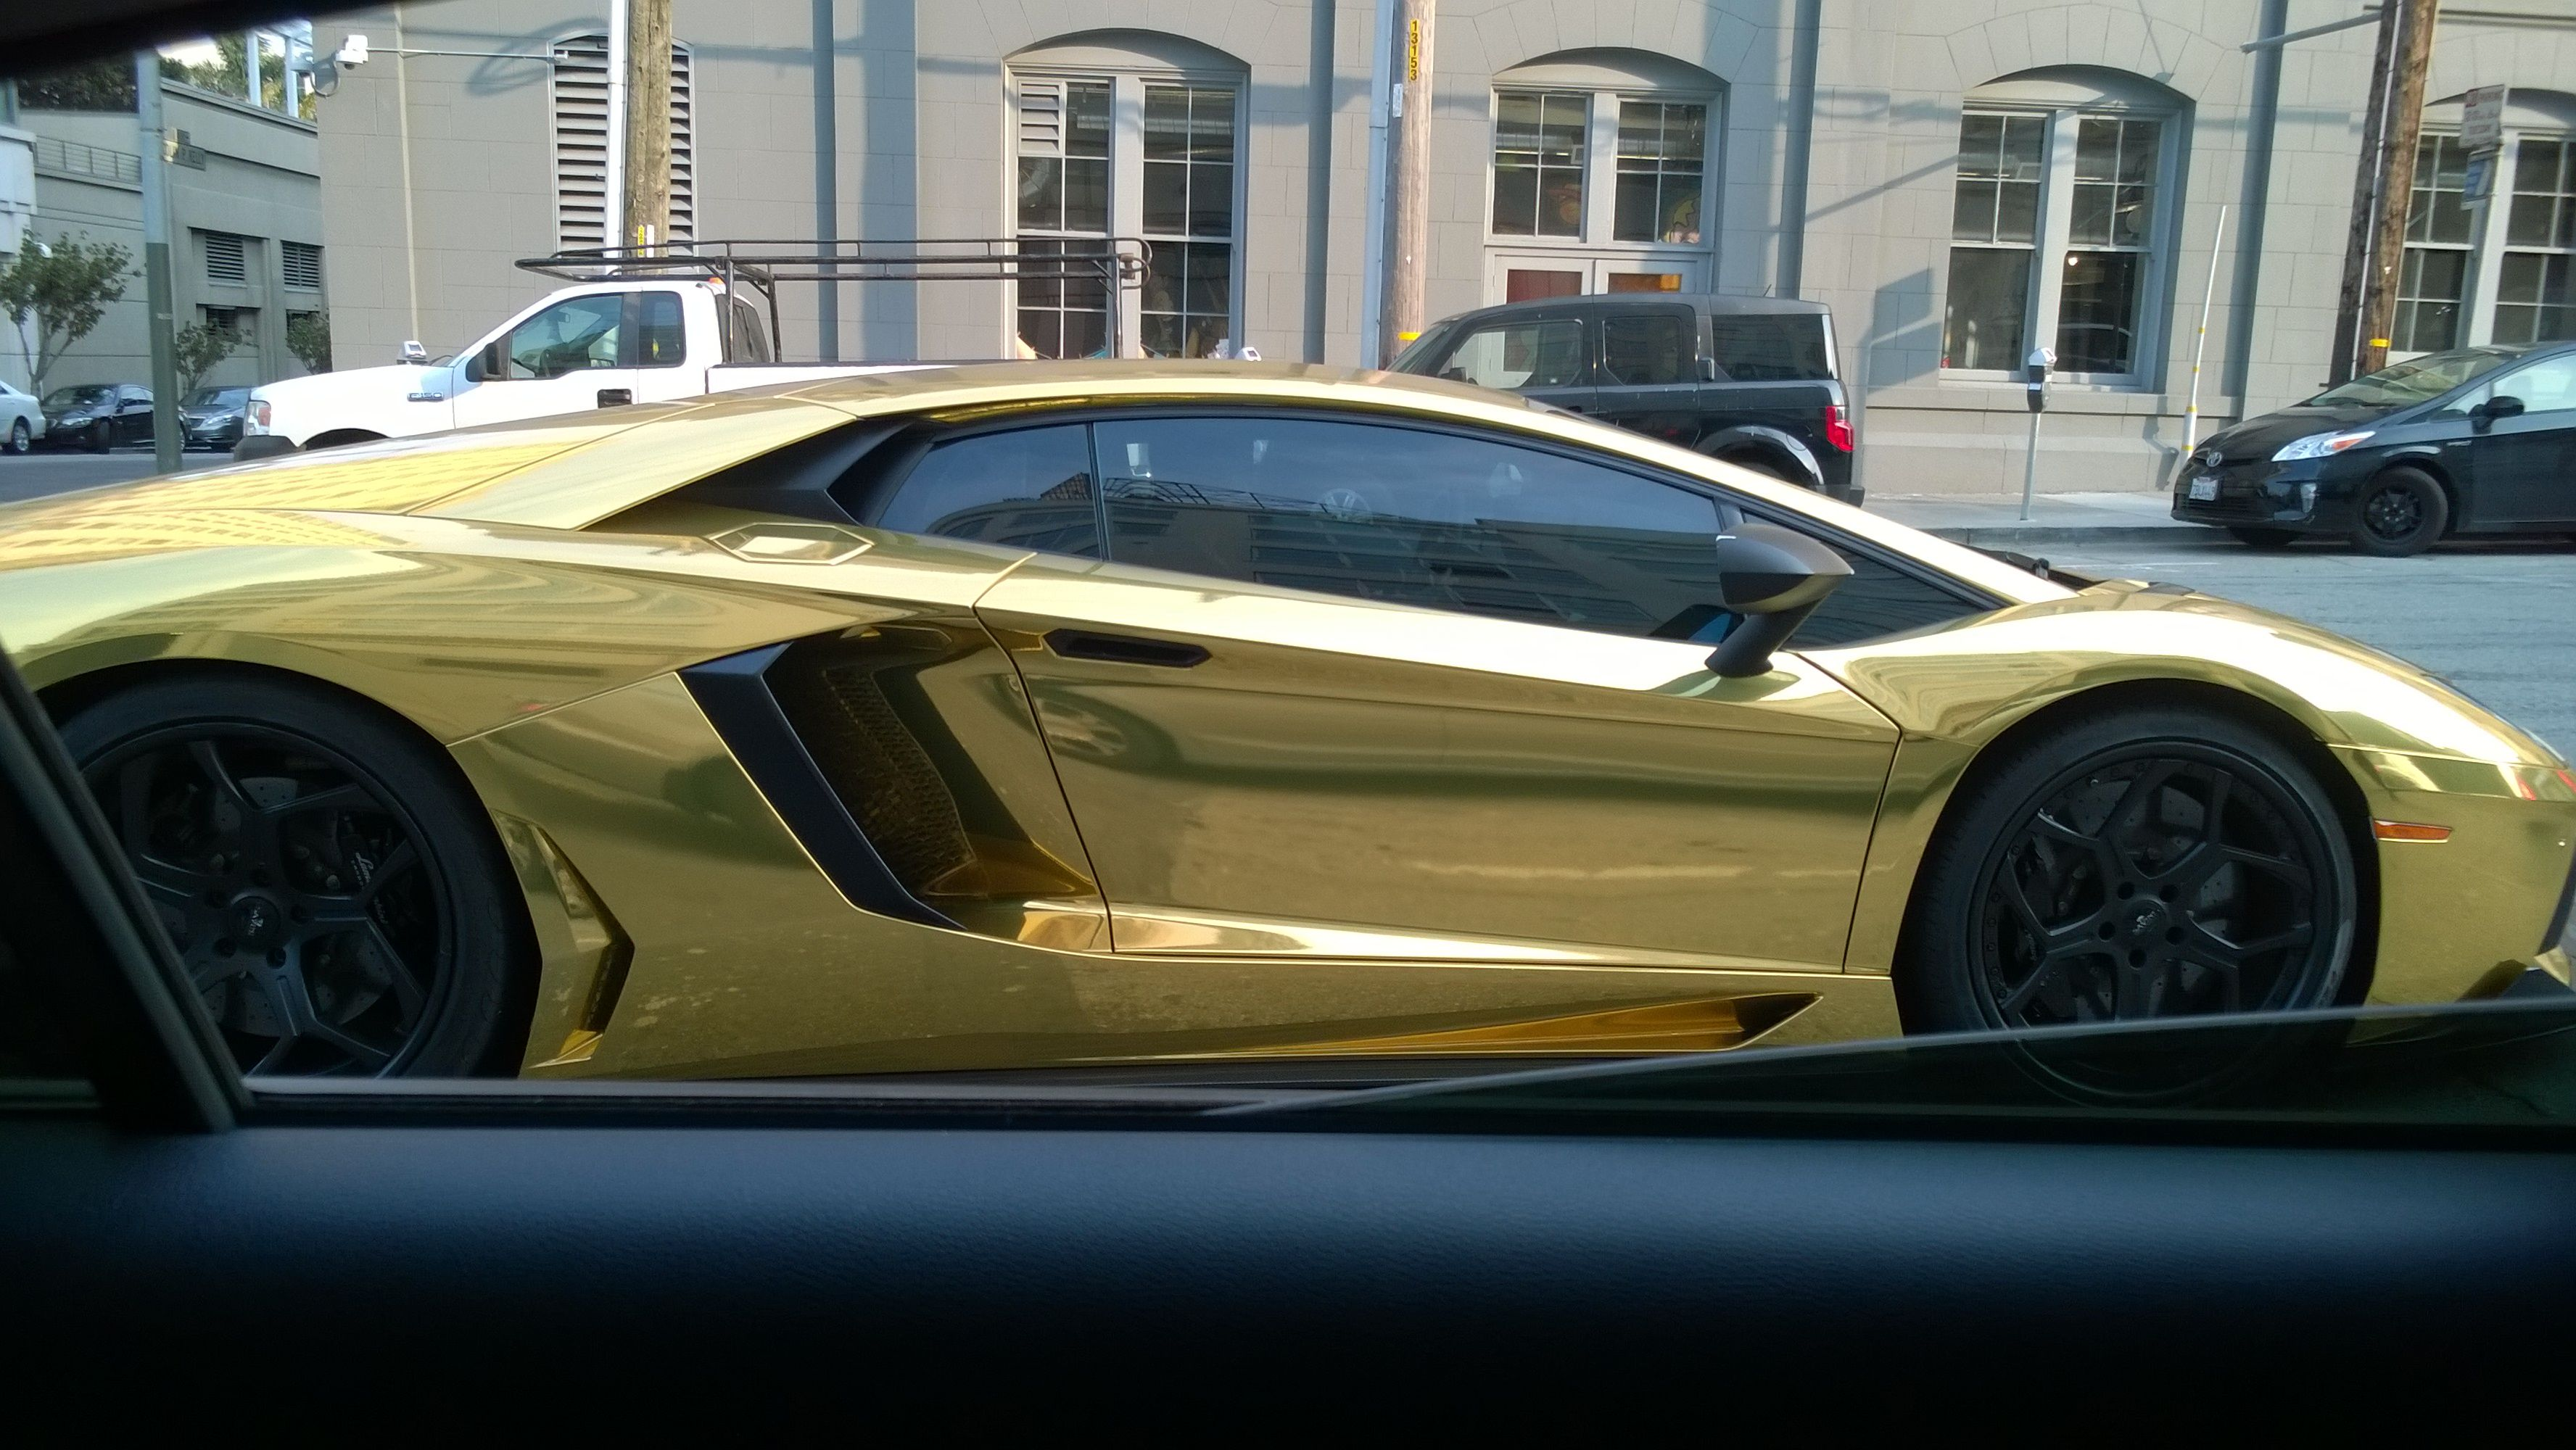 Lamborghini San Francisco >> Gold Plated Lamborghini In San Francisco Cool Cars